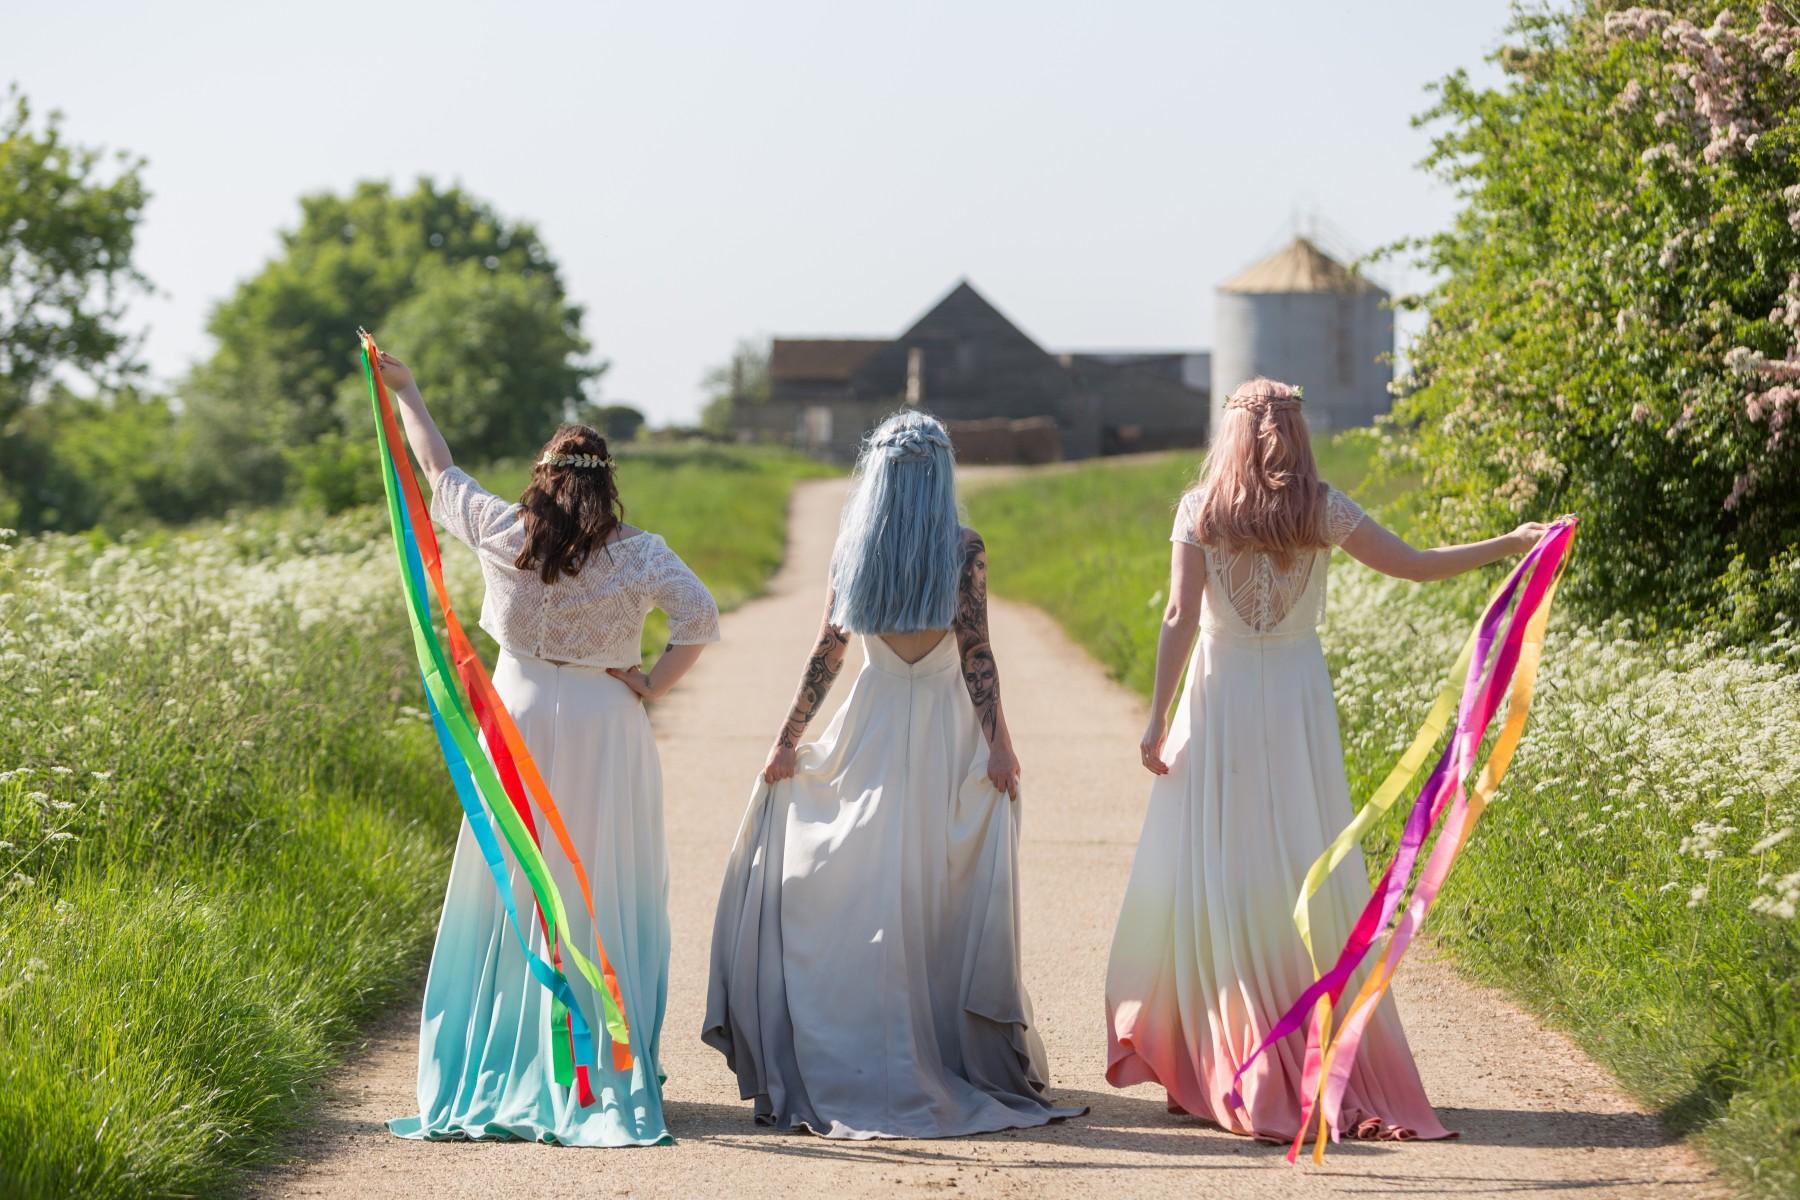 Lucy Can't Dance - Dip Dye Bridal wear - alternative bridal wear - unique wedding dress - Jodi Hanagan Photography